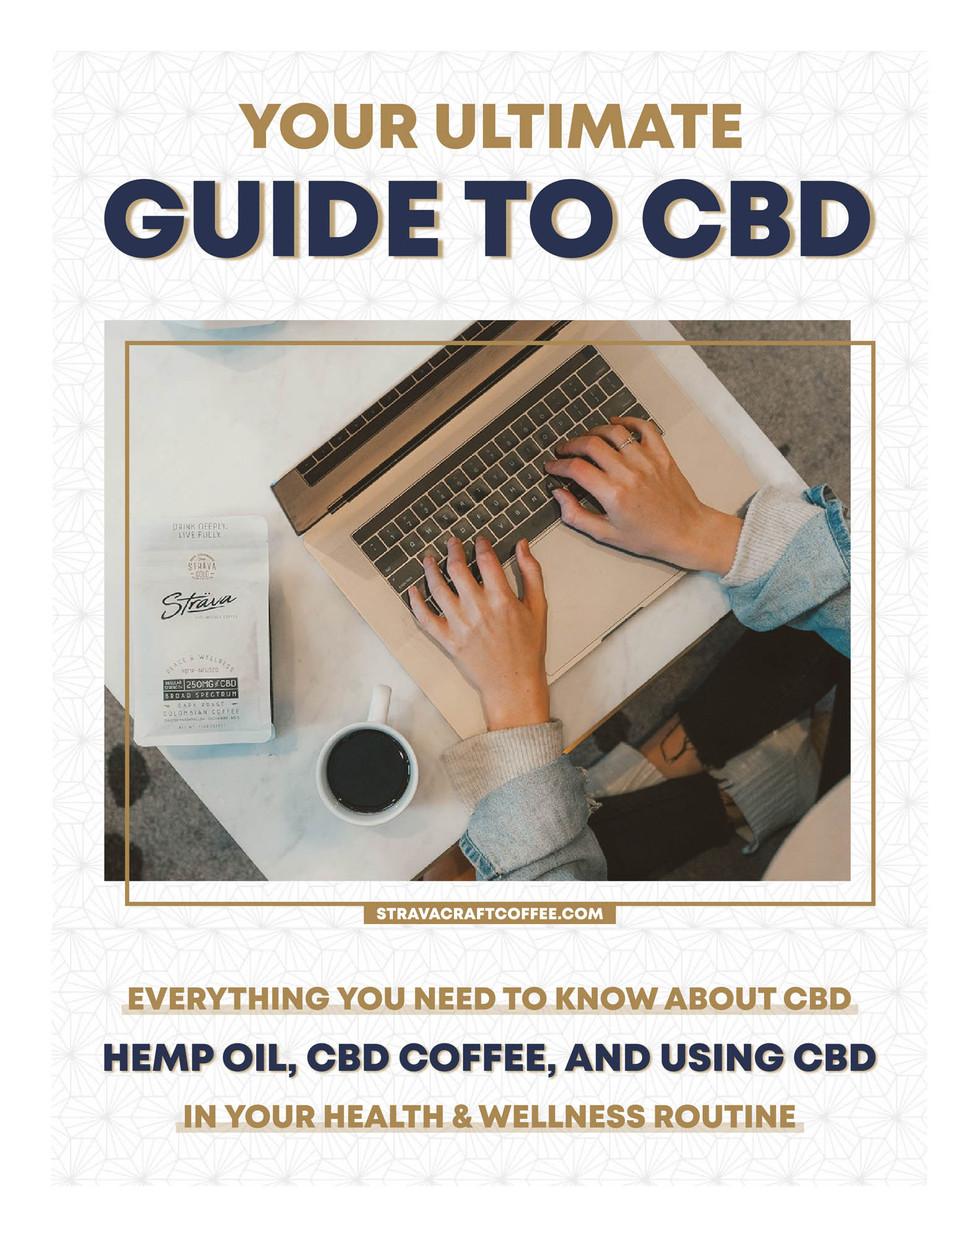 Guide to CBD - Ebook Cover Design by Zhillmatic